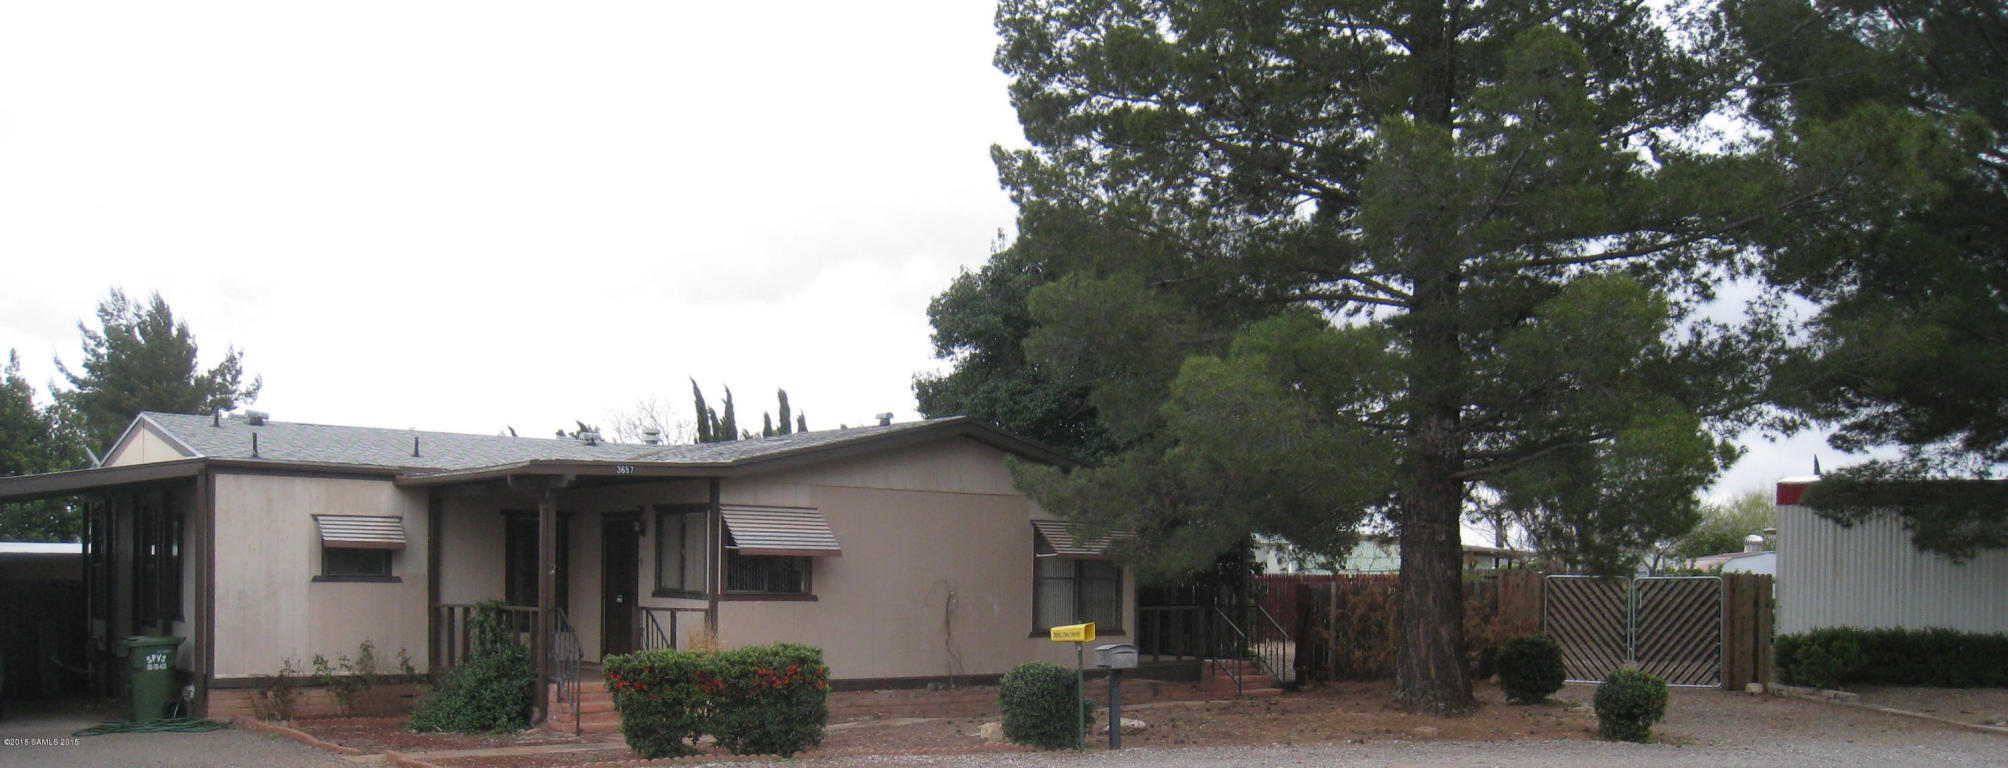 Rental Homes for Rent, ListingId:32030909, location: 3657 S Elf Owl Place Sierra Vista 85650